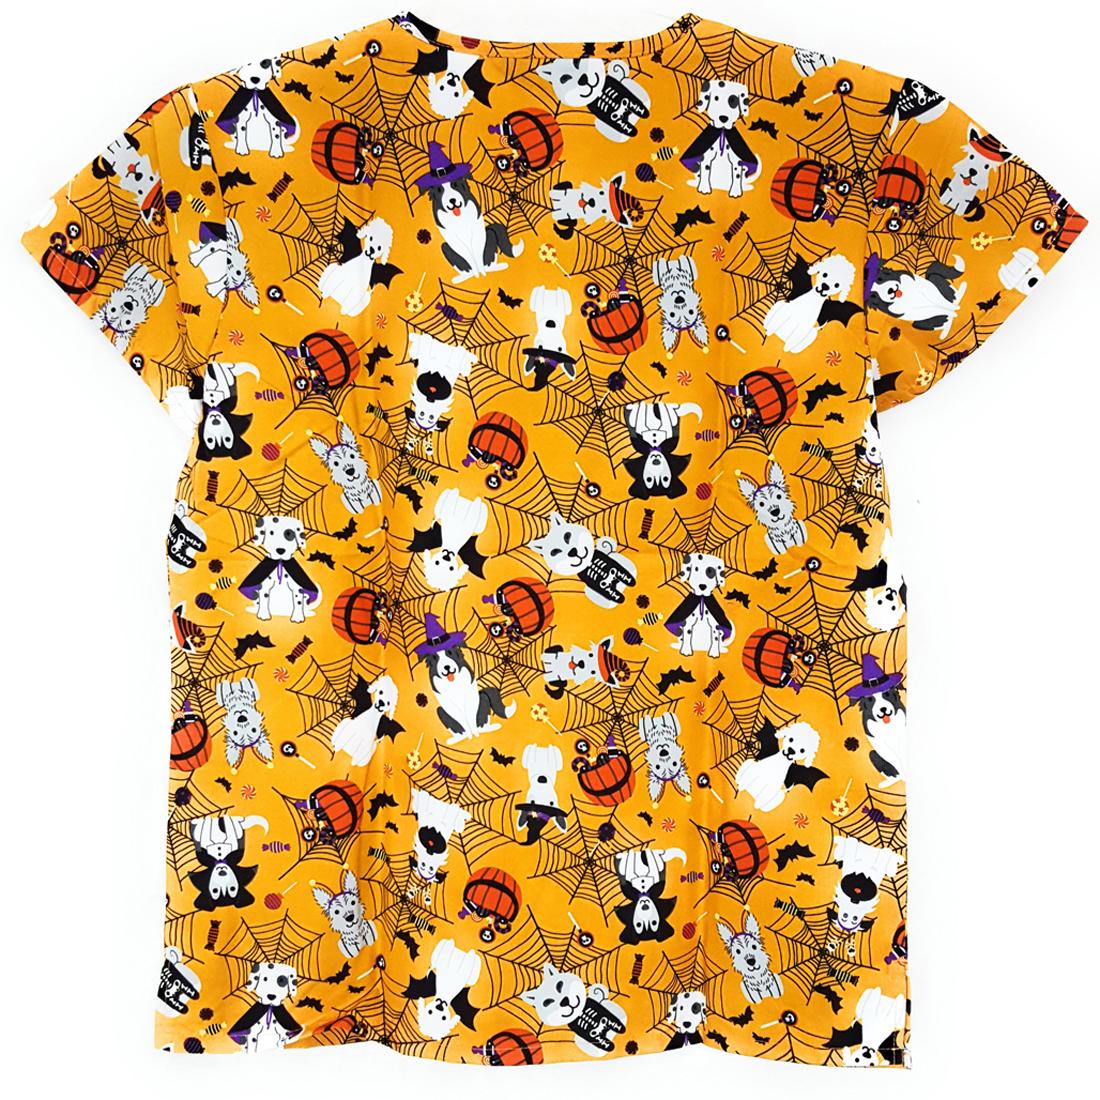 V-Neck-Halloween-Print-Scrub-Top-Microfiber-Medical-Uniform-Shirt-DSF-Uniforms miniature 15